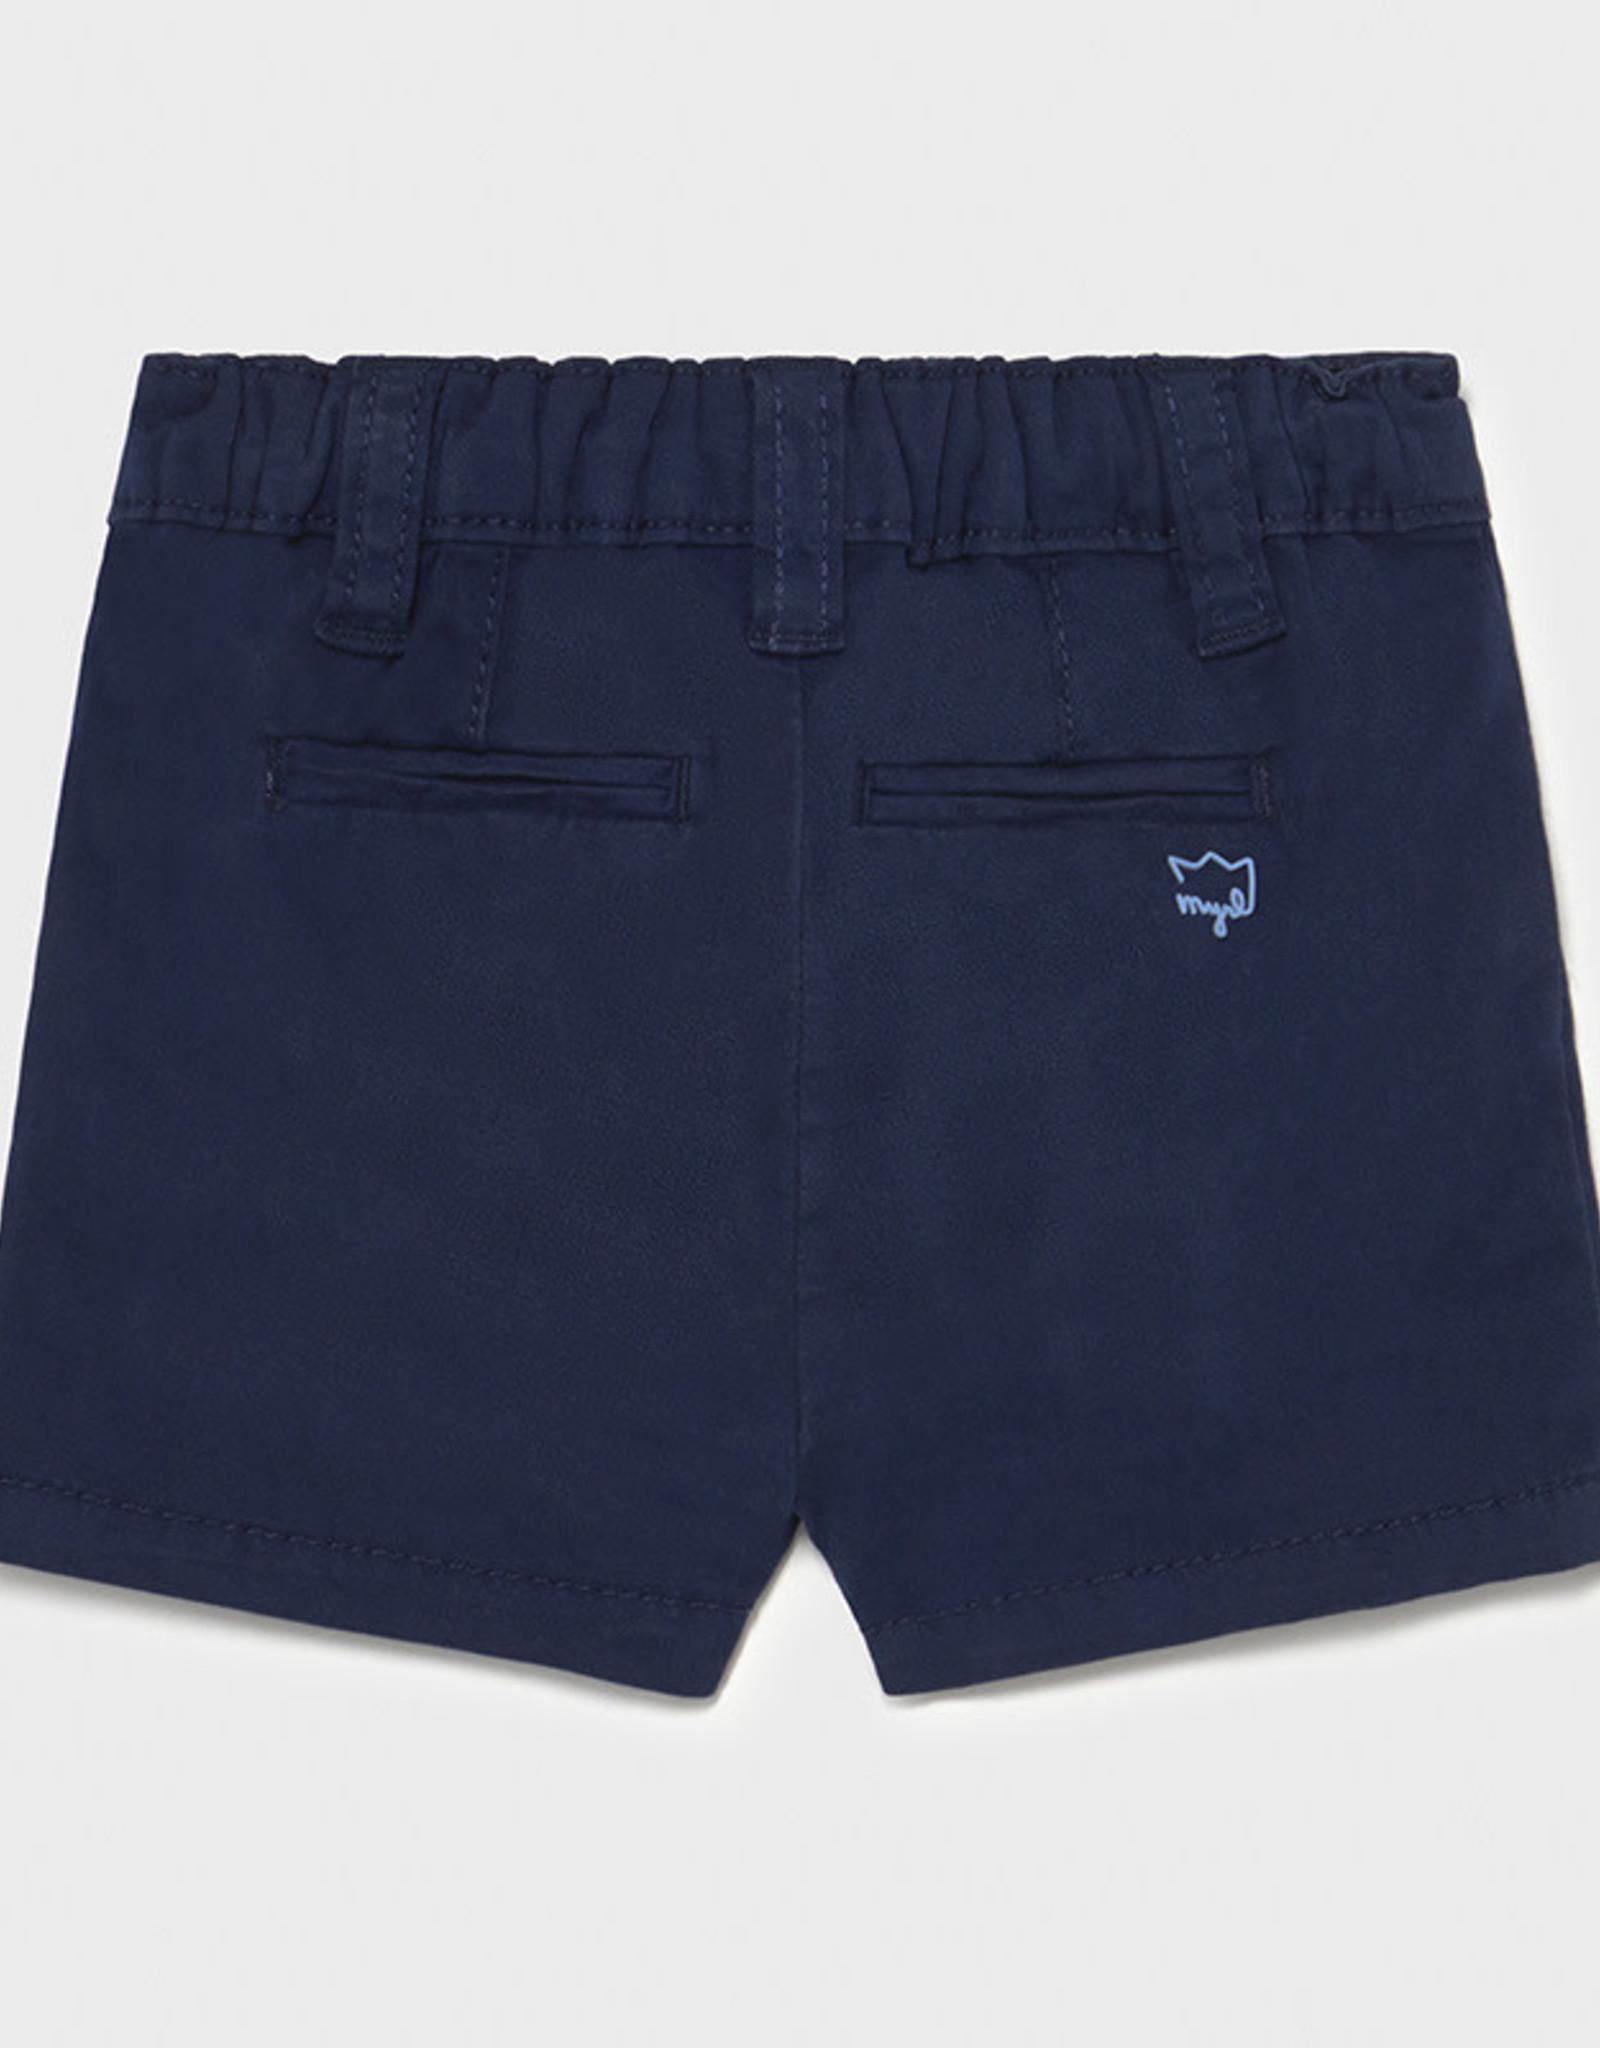 Mayoral Twill Shorts, Navy